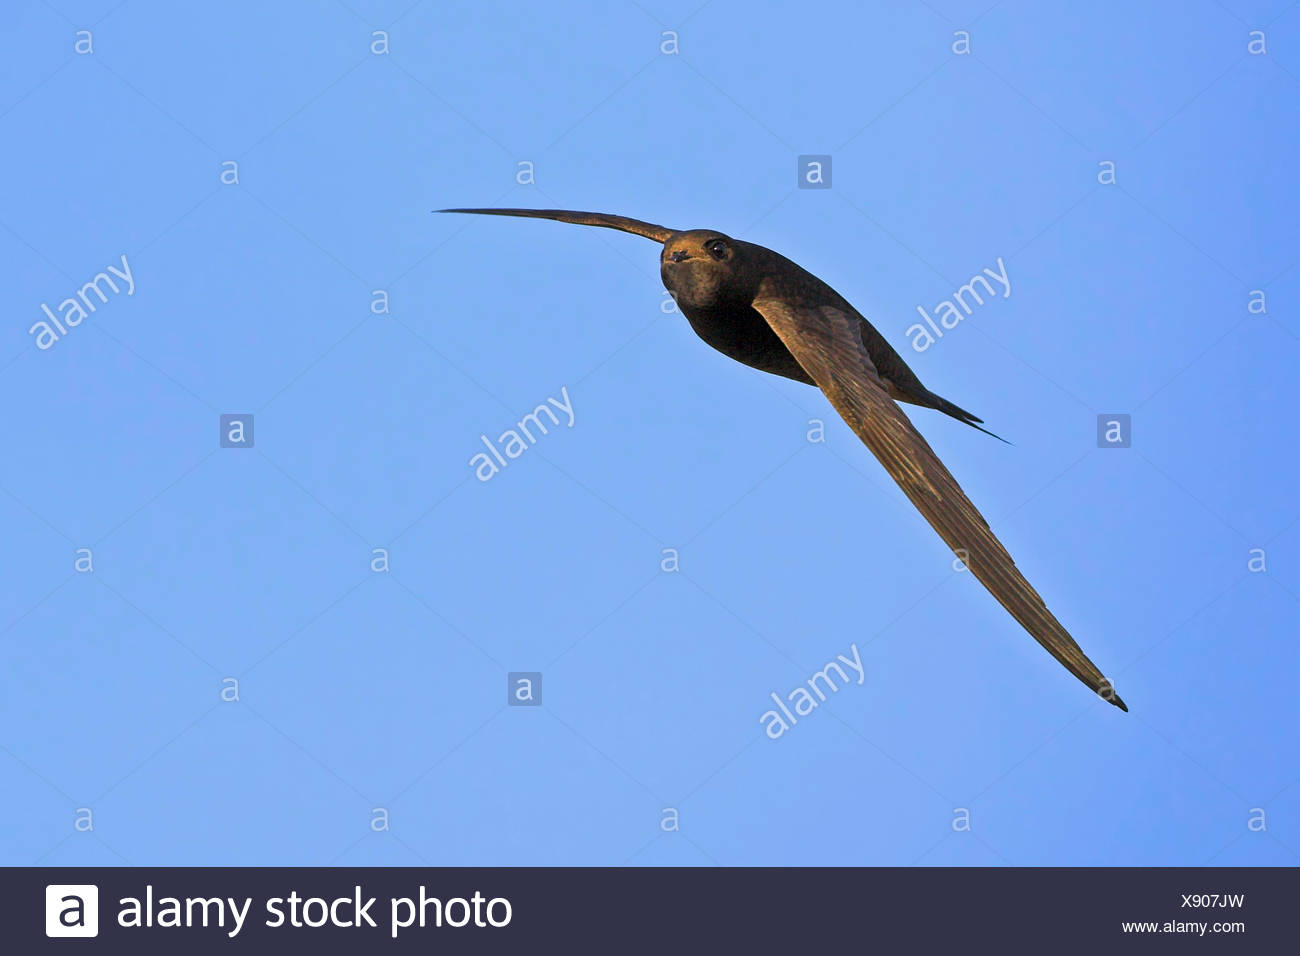 Eurasian swift (Apus apus), in flight in the blue sky , Germany, Baden-Wuerttemberg - Stock Image